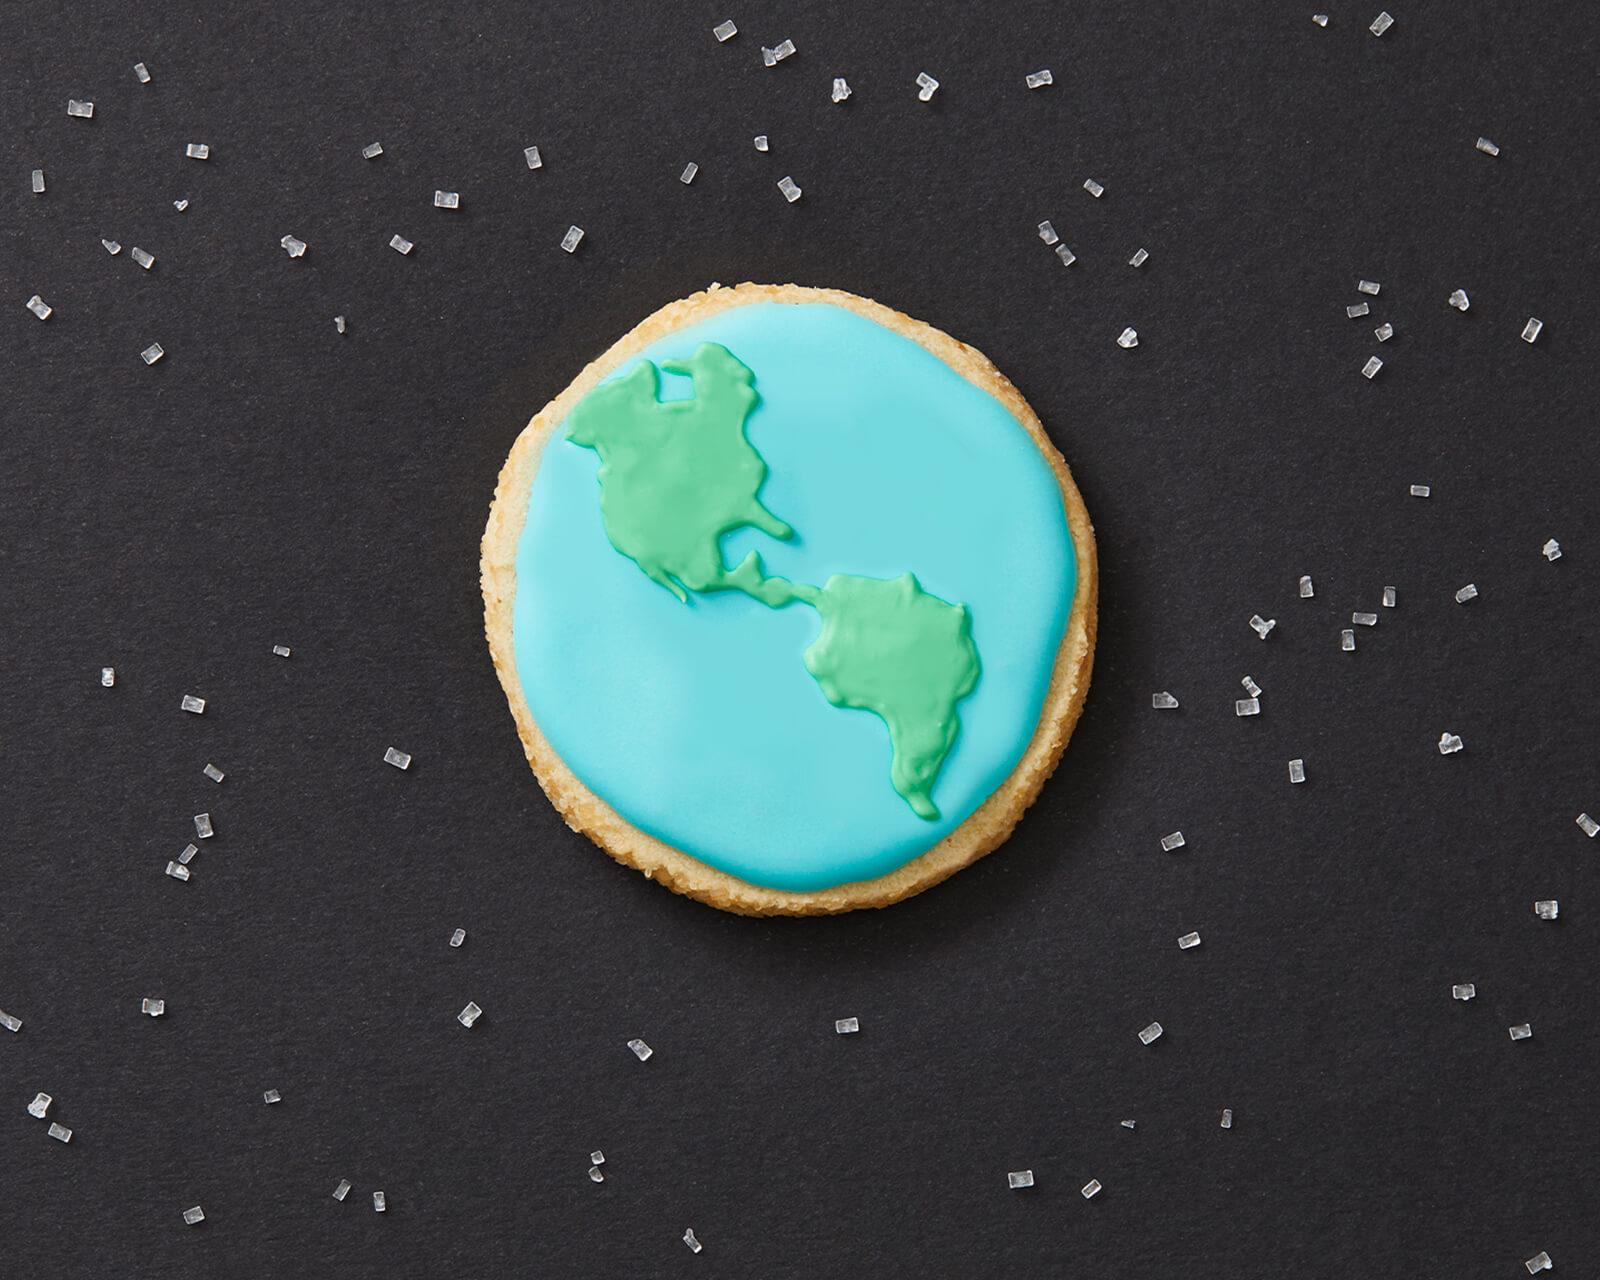 Walkers Earth Day Cookies